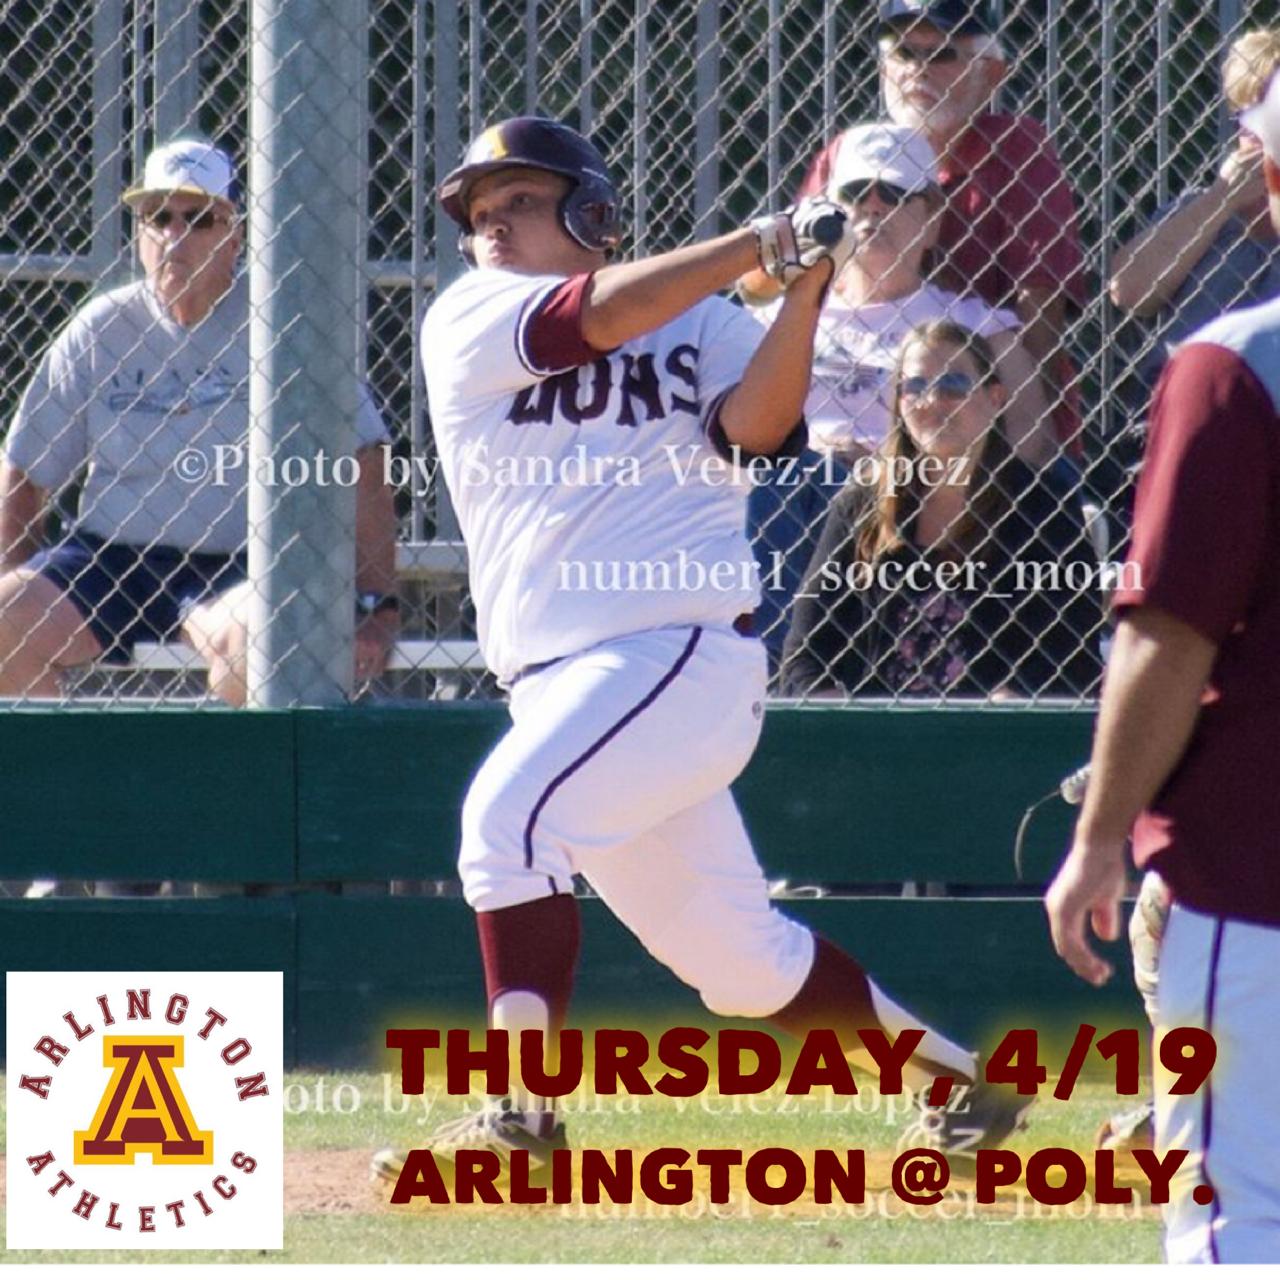 Arlington Baseball at Poly on Thursday, 4/19/2018.